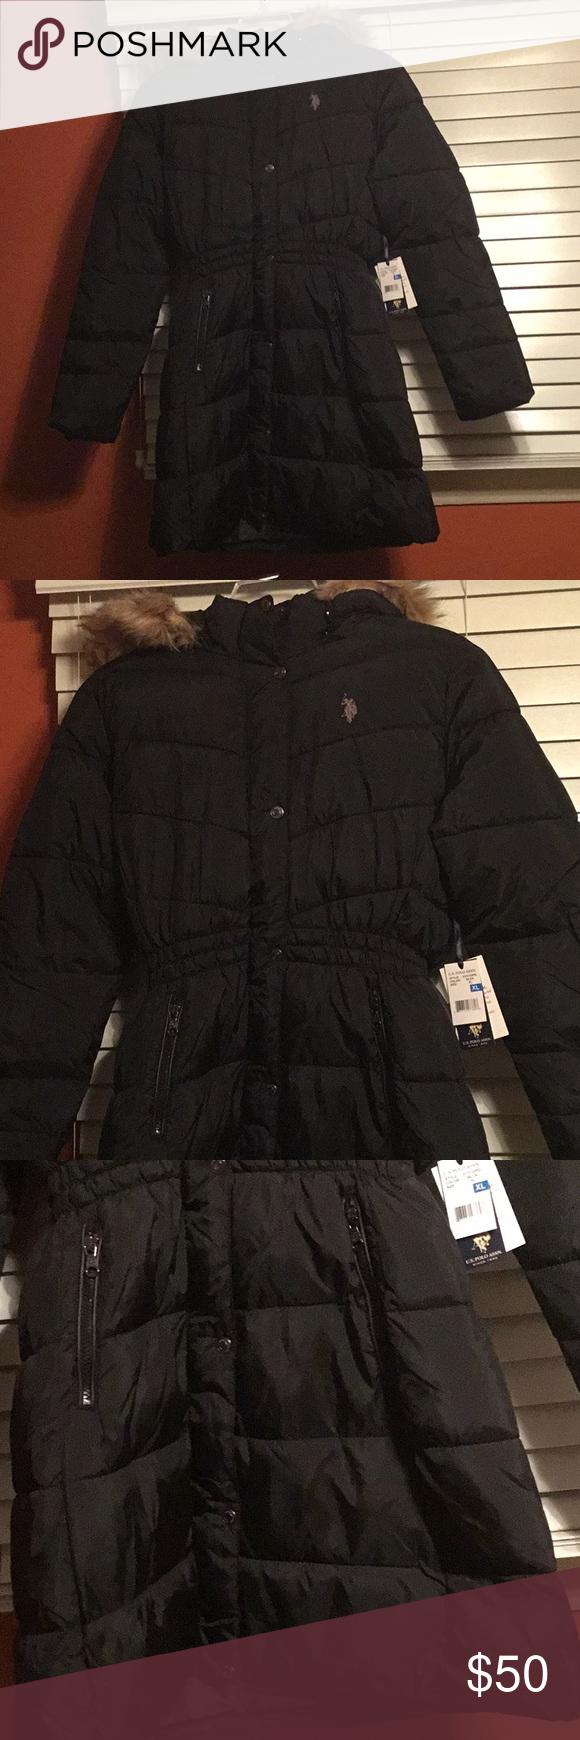 U.S. Polo Long Puffer Coat w/Faux Fur Trimmed Hood NWT